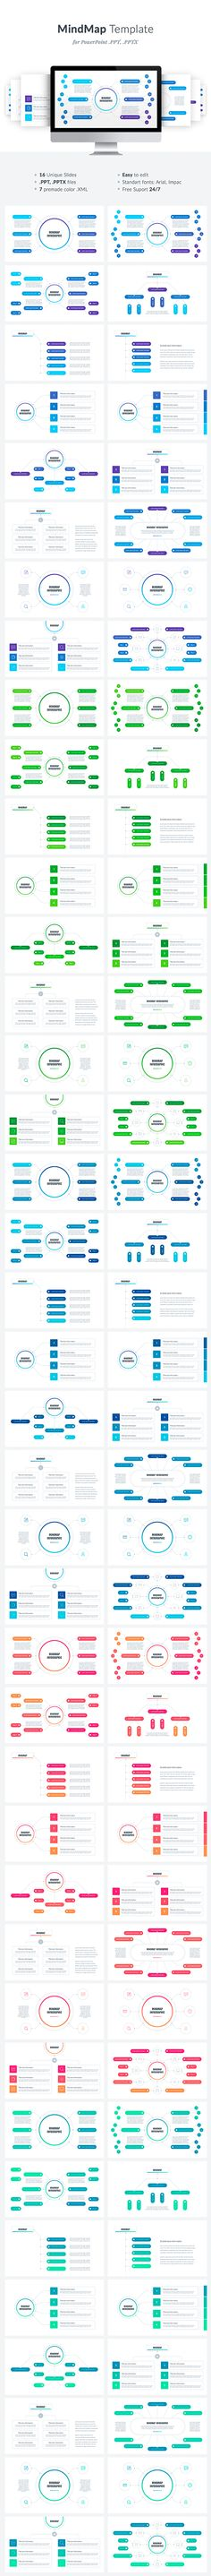 Mindmap PowerPoint Template - Pitch Deck PowerPoint Templates